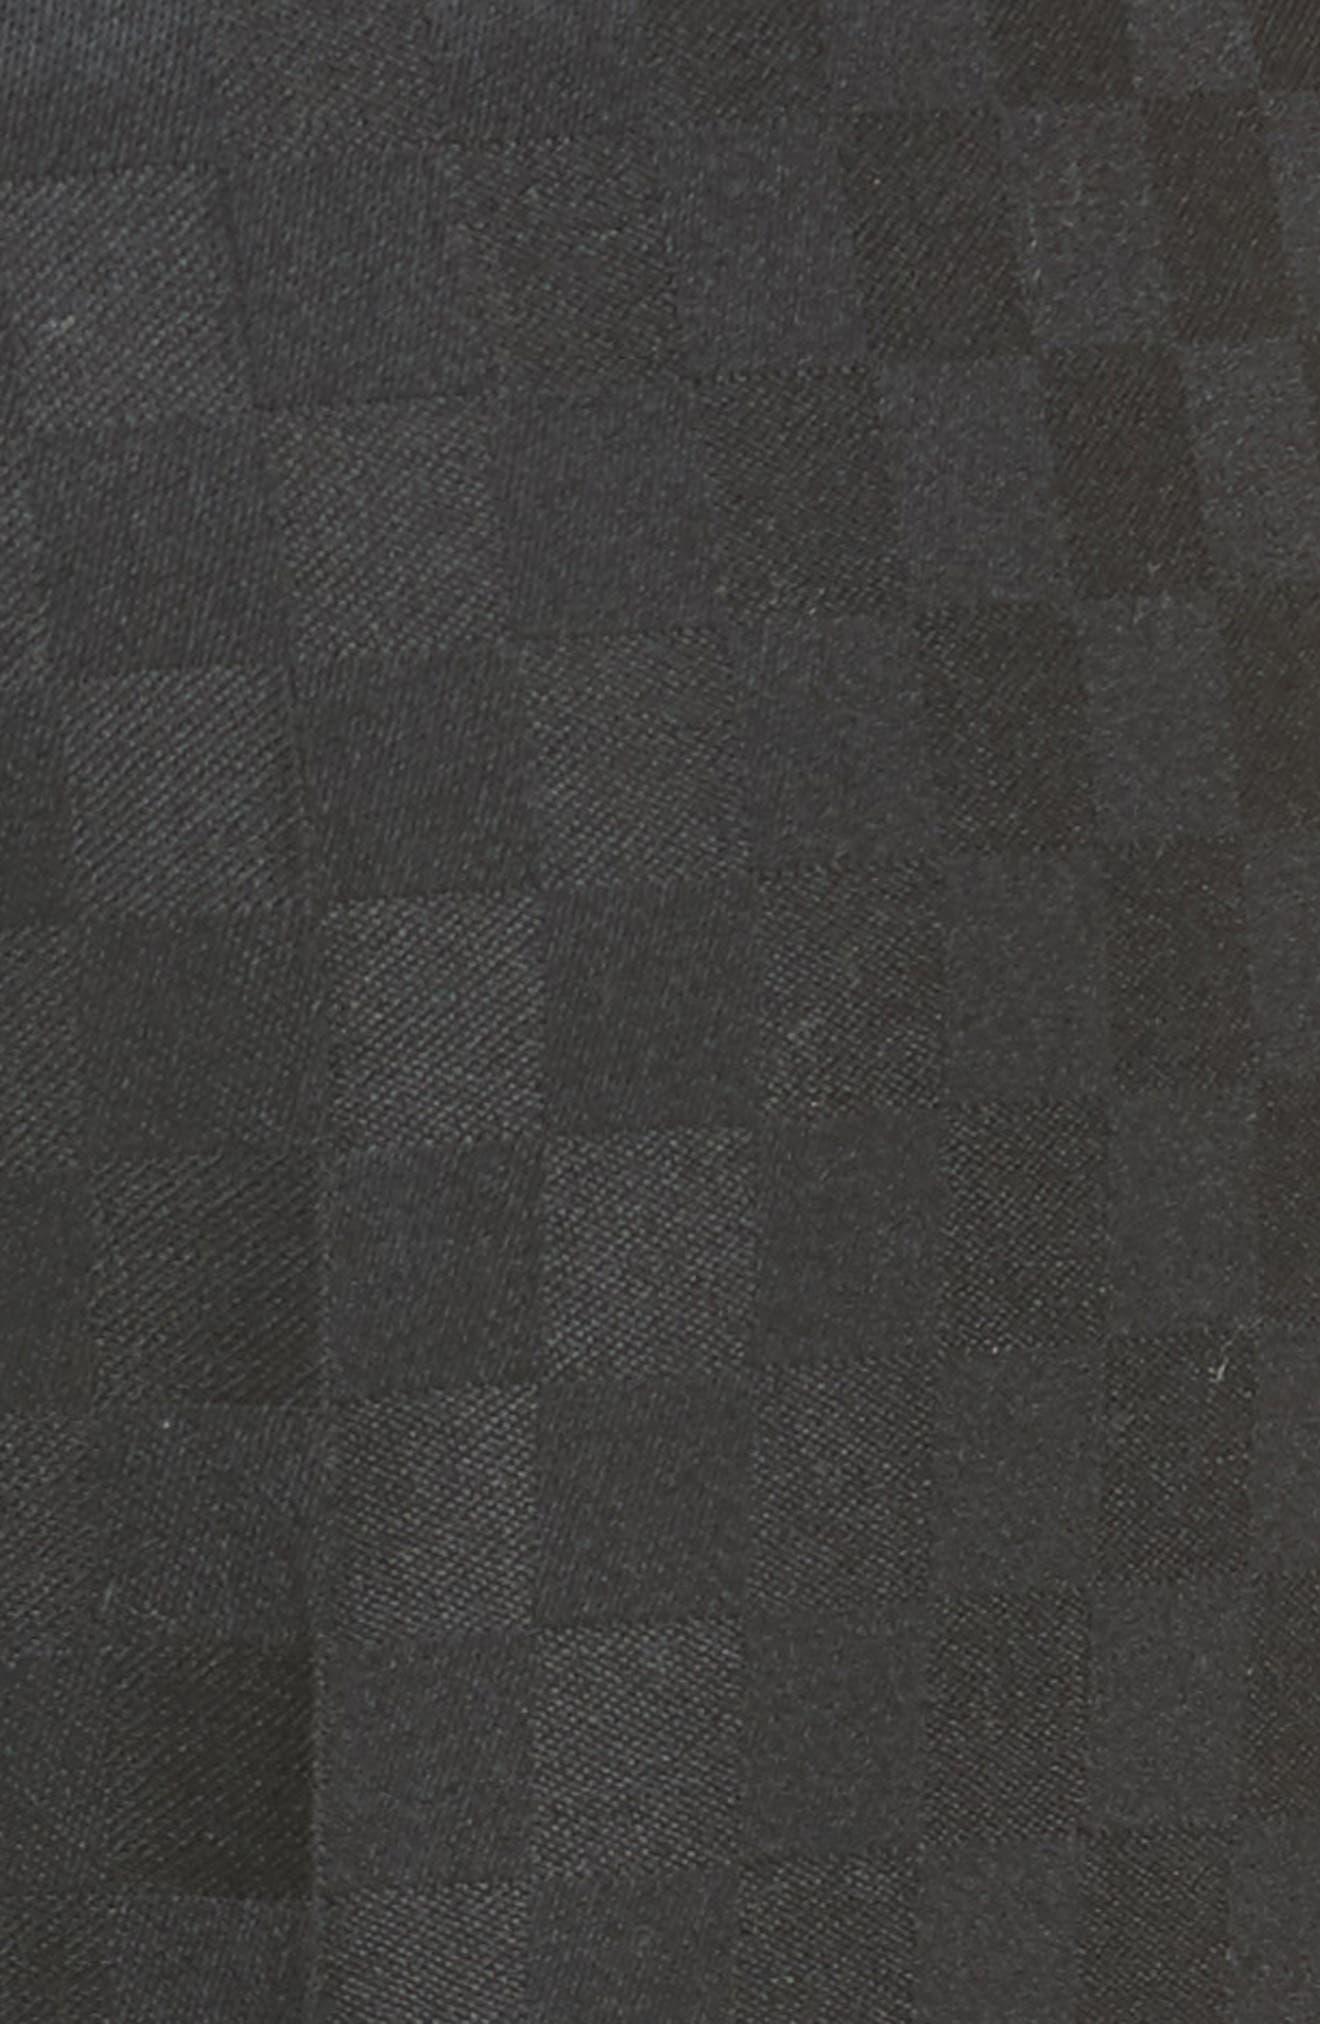 Chain Trim Checkerboard Pants,                             Alternate thumbnail 5, color,                             001